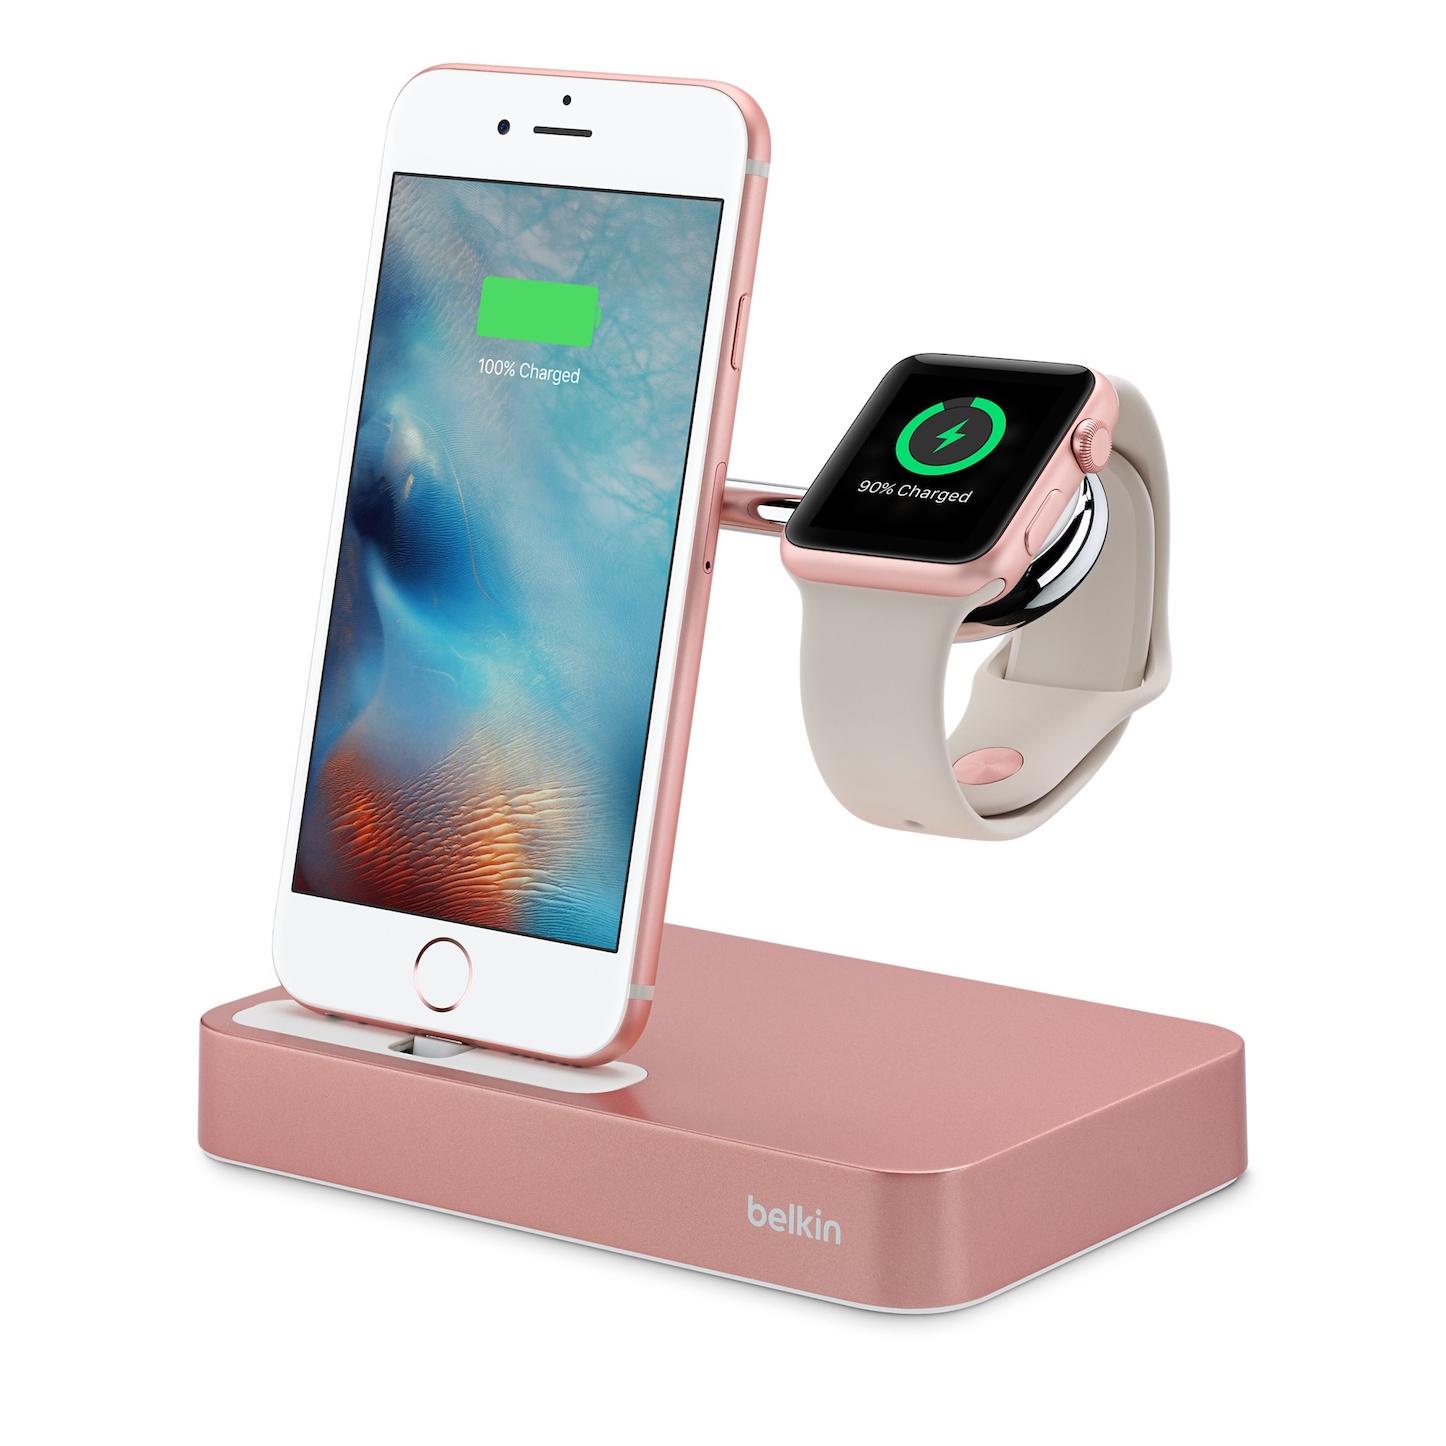 Belkin-Valet-Charge-Dock-for-Apple-Watch-iPhone-2.jpeg